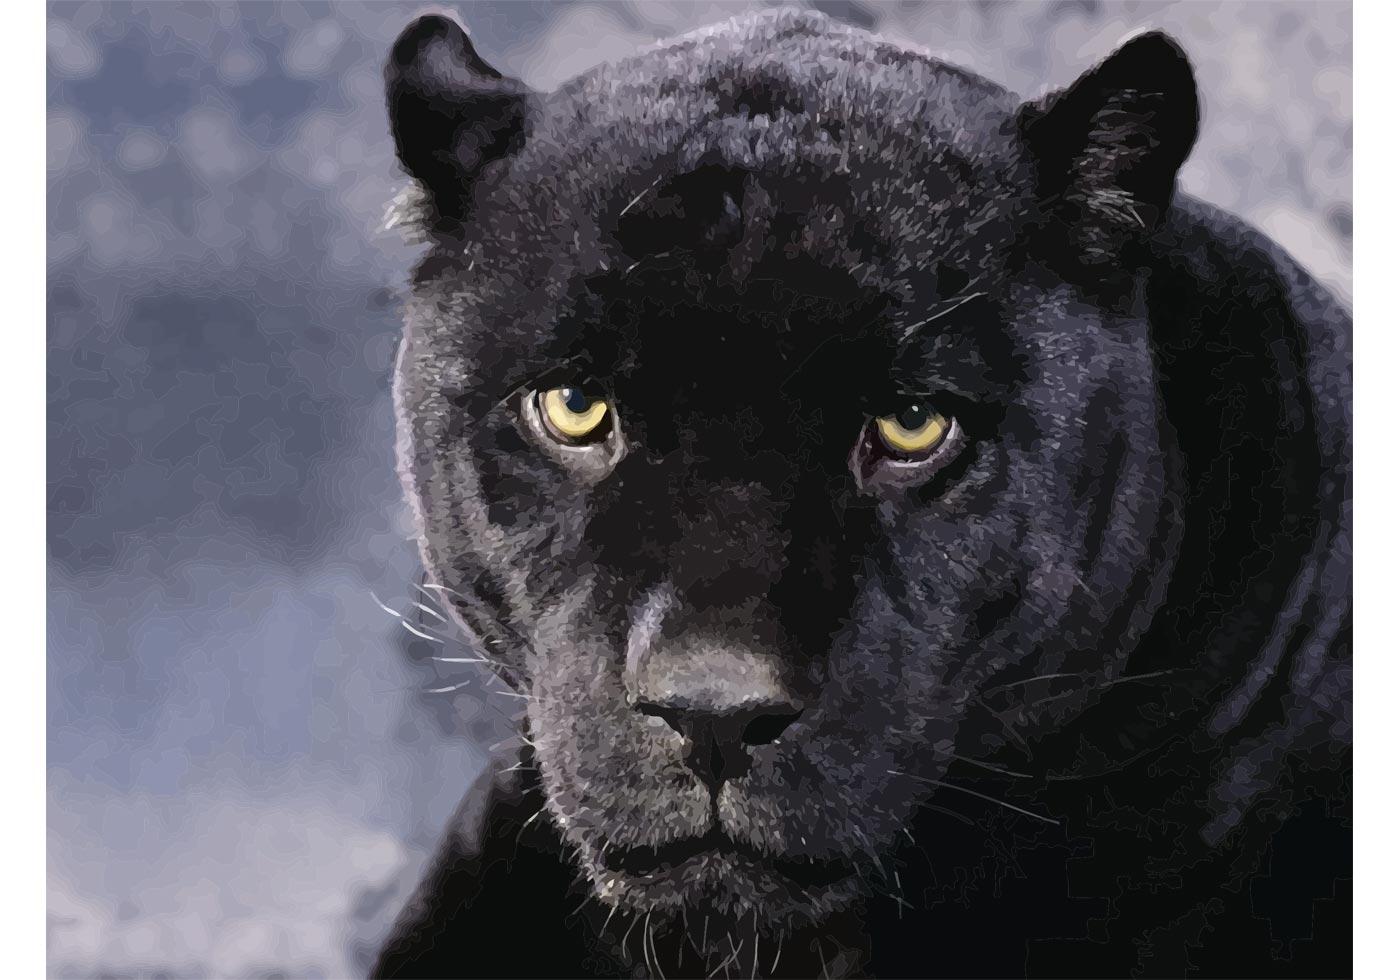 Black Panther Image Download Free Vector Art Stock